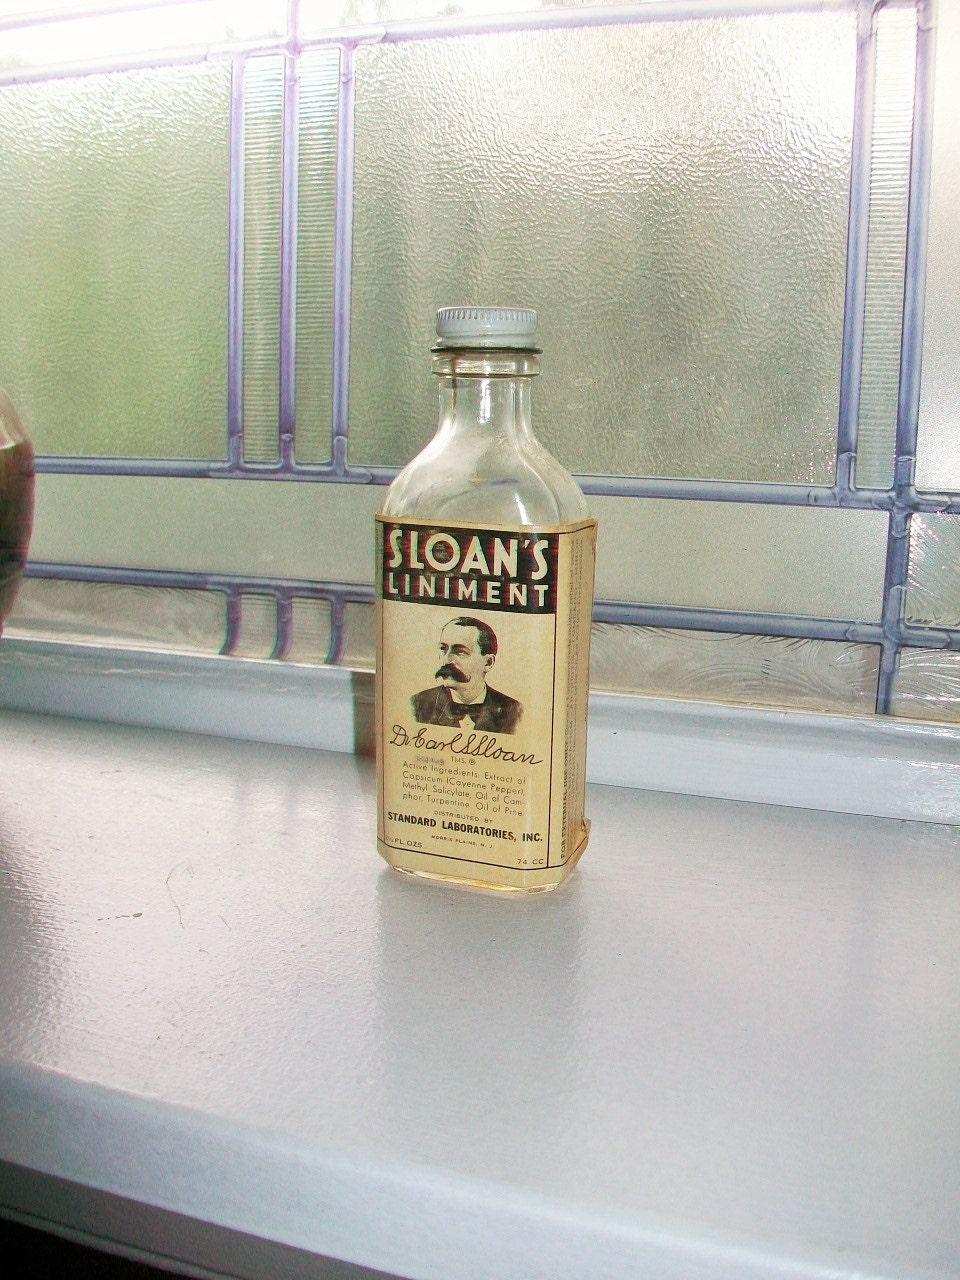 sloans liniment bottle dating